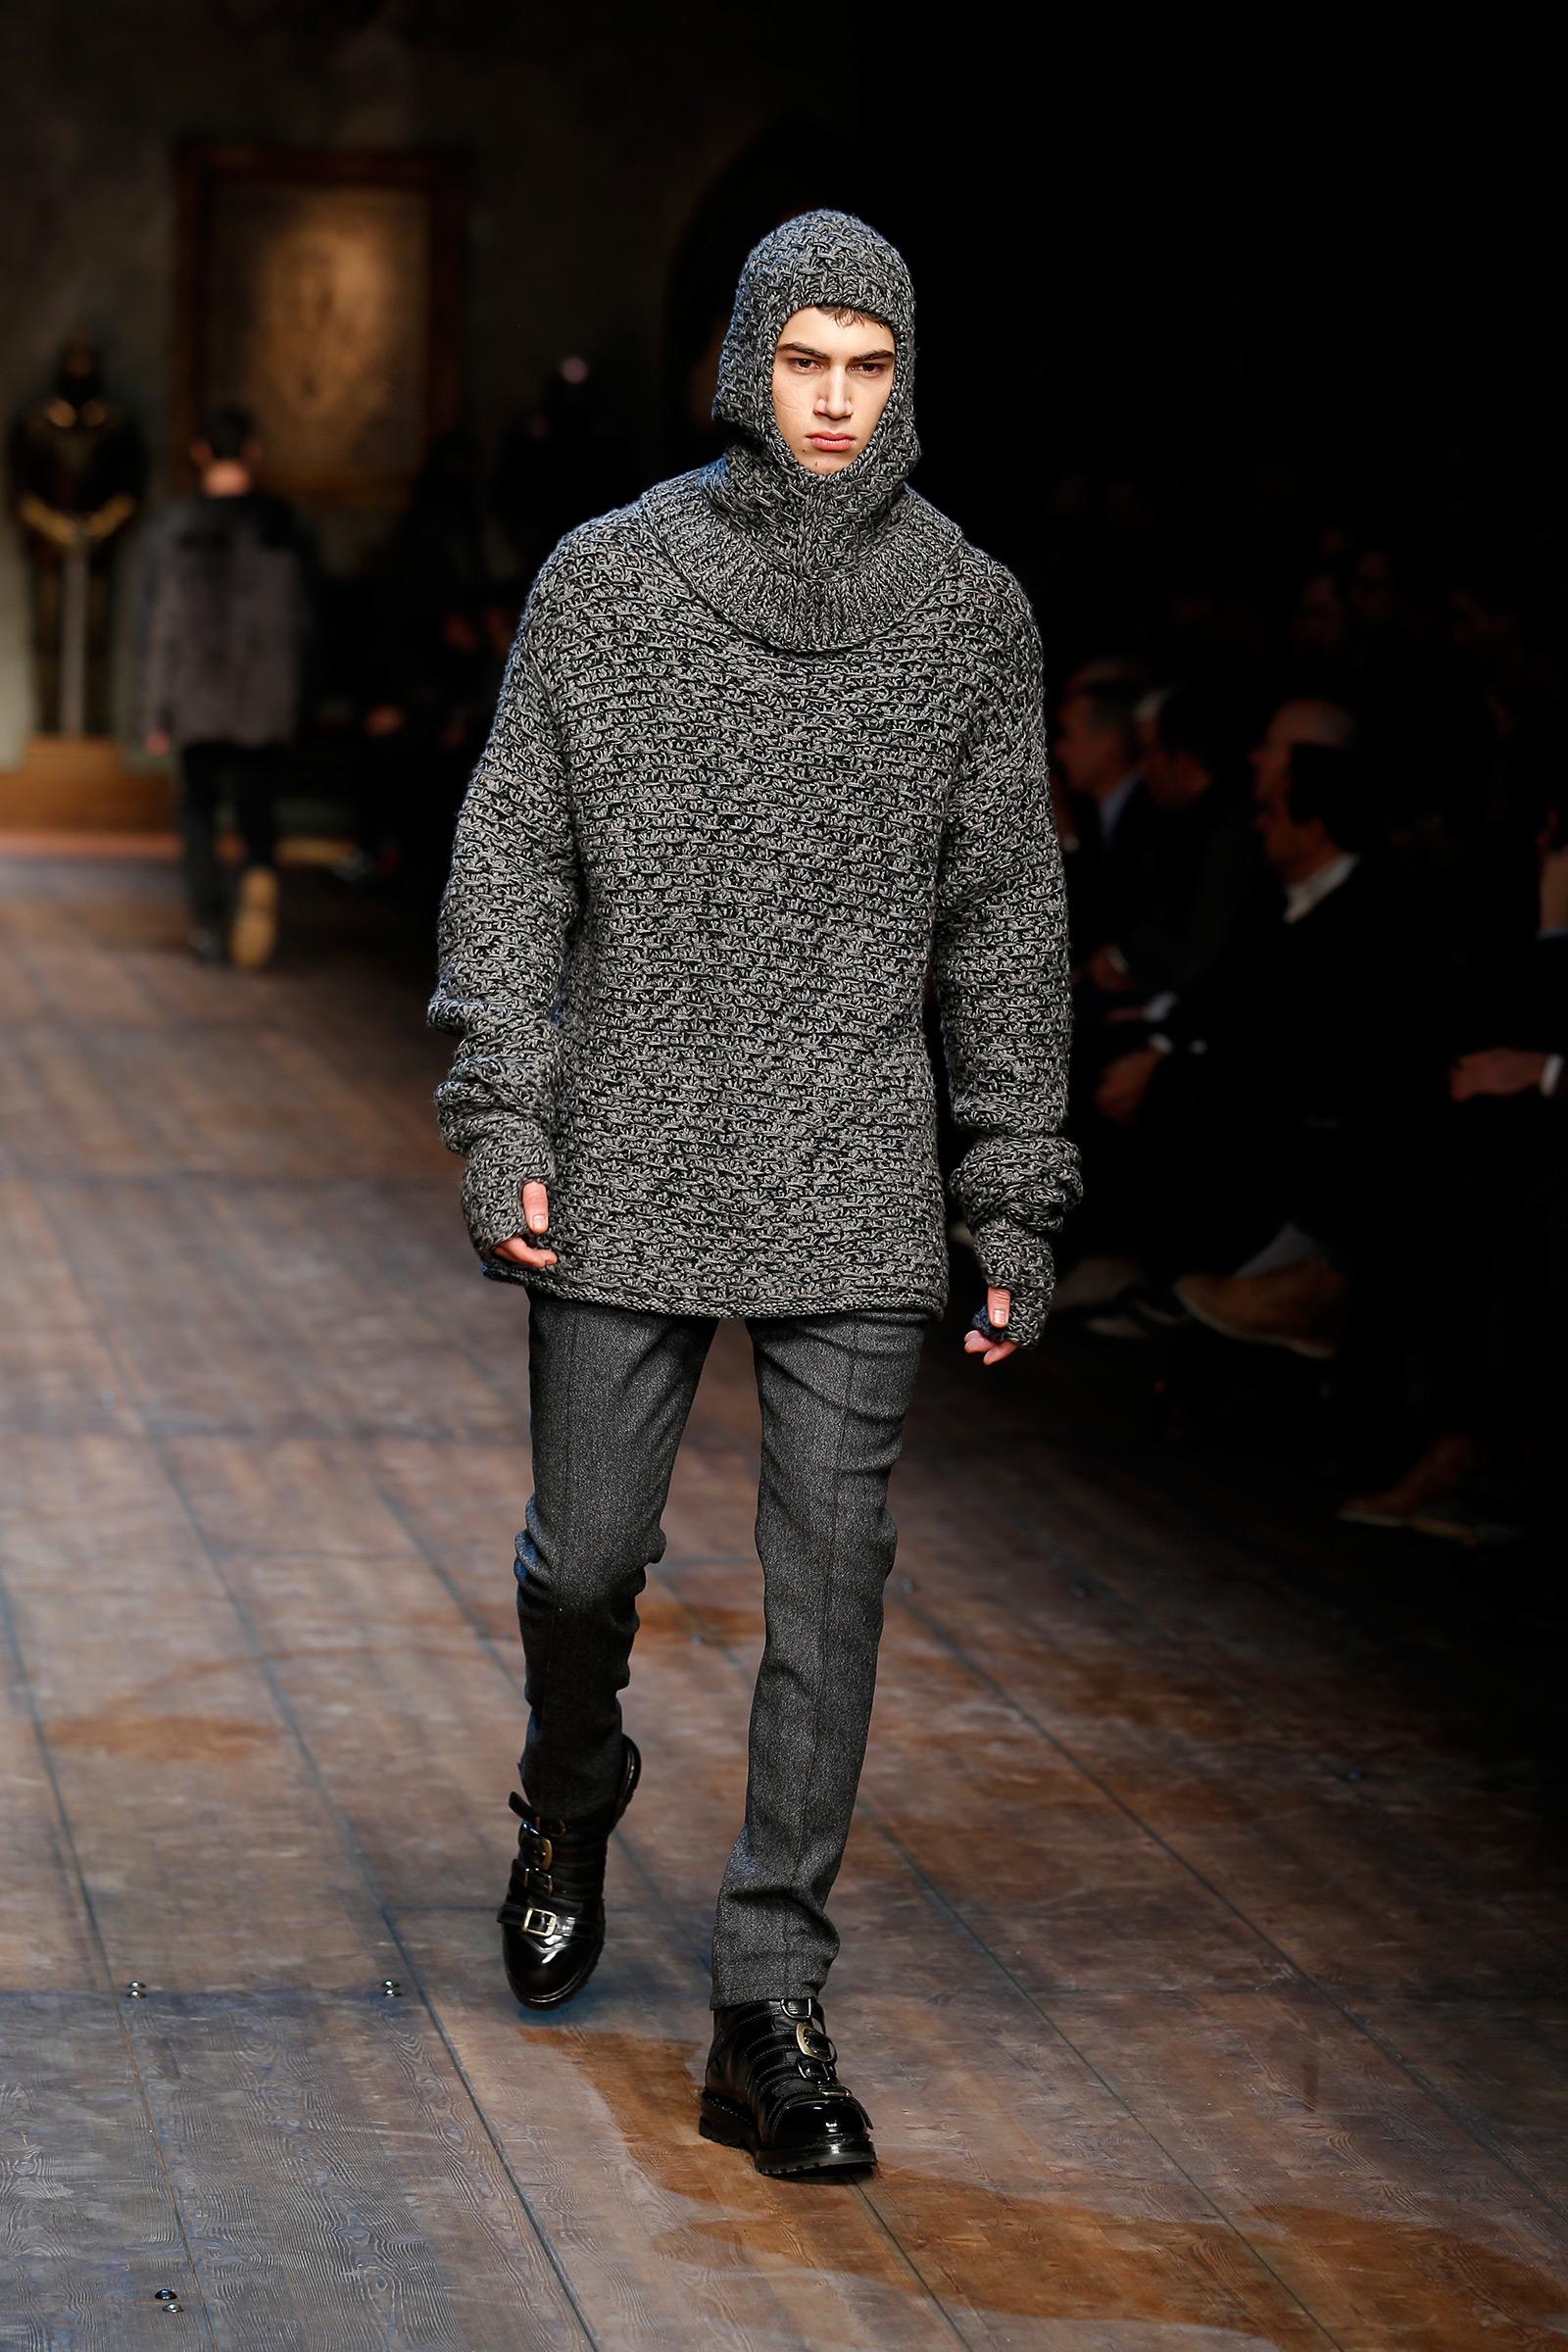 dolce-and-gabbana-fw-2014-2015-men-fashion-show-runway-46